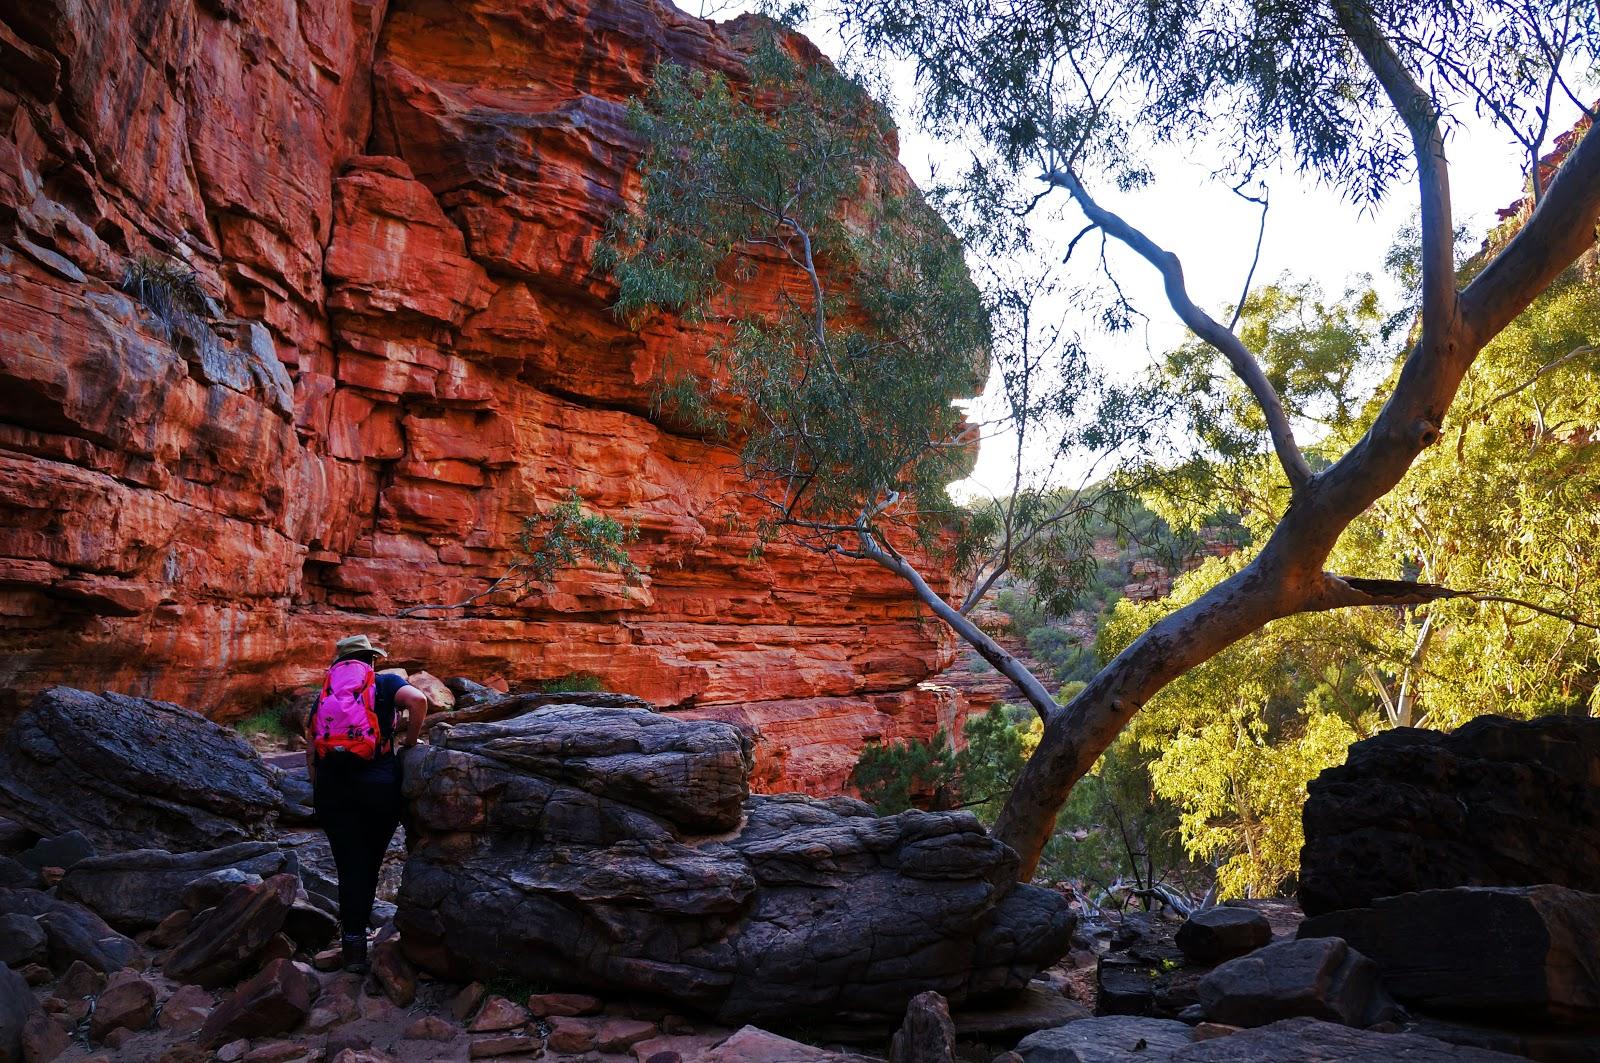 Z Bend River Trail Kalbarri National Park The Long Way